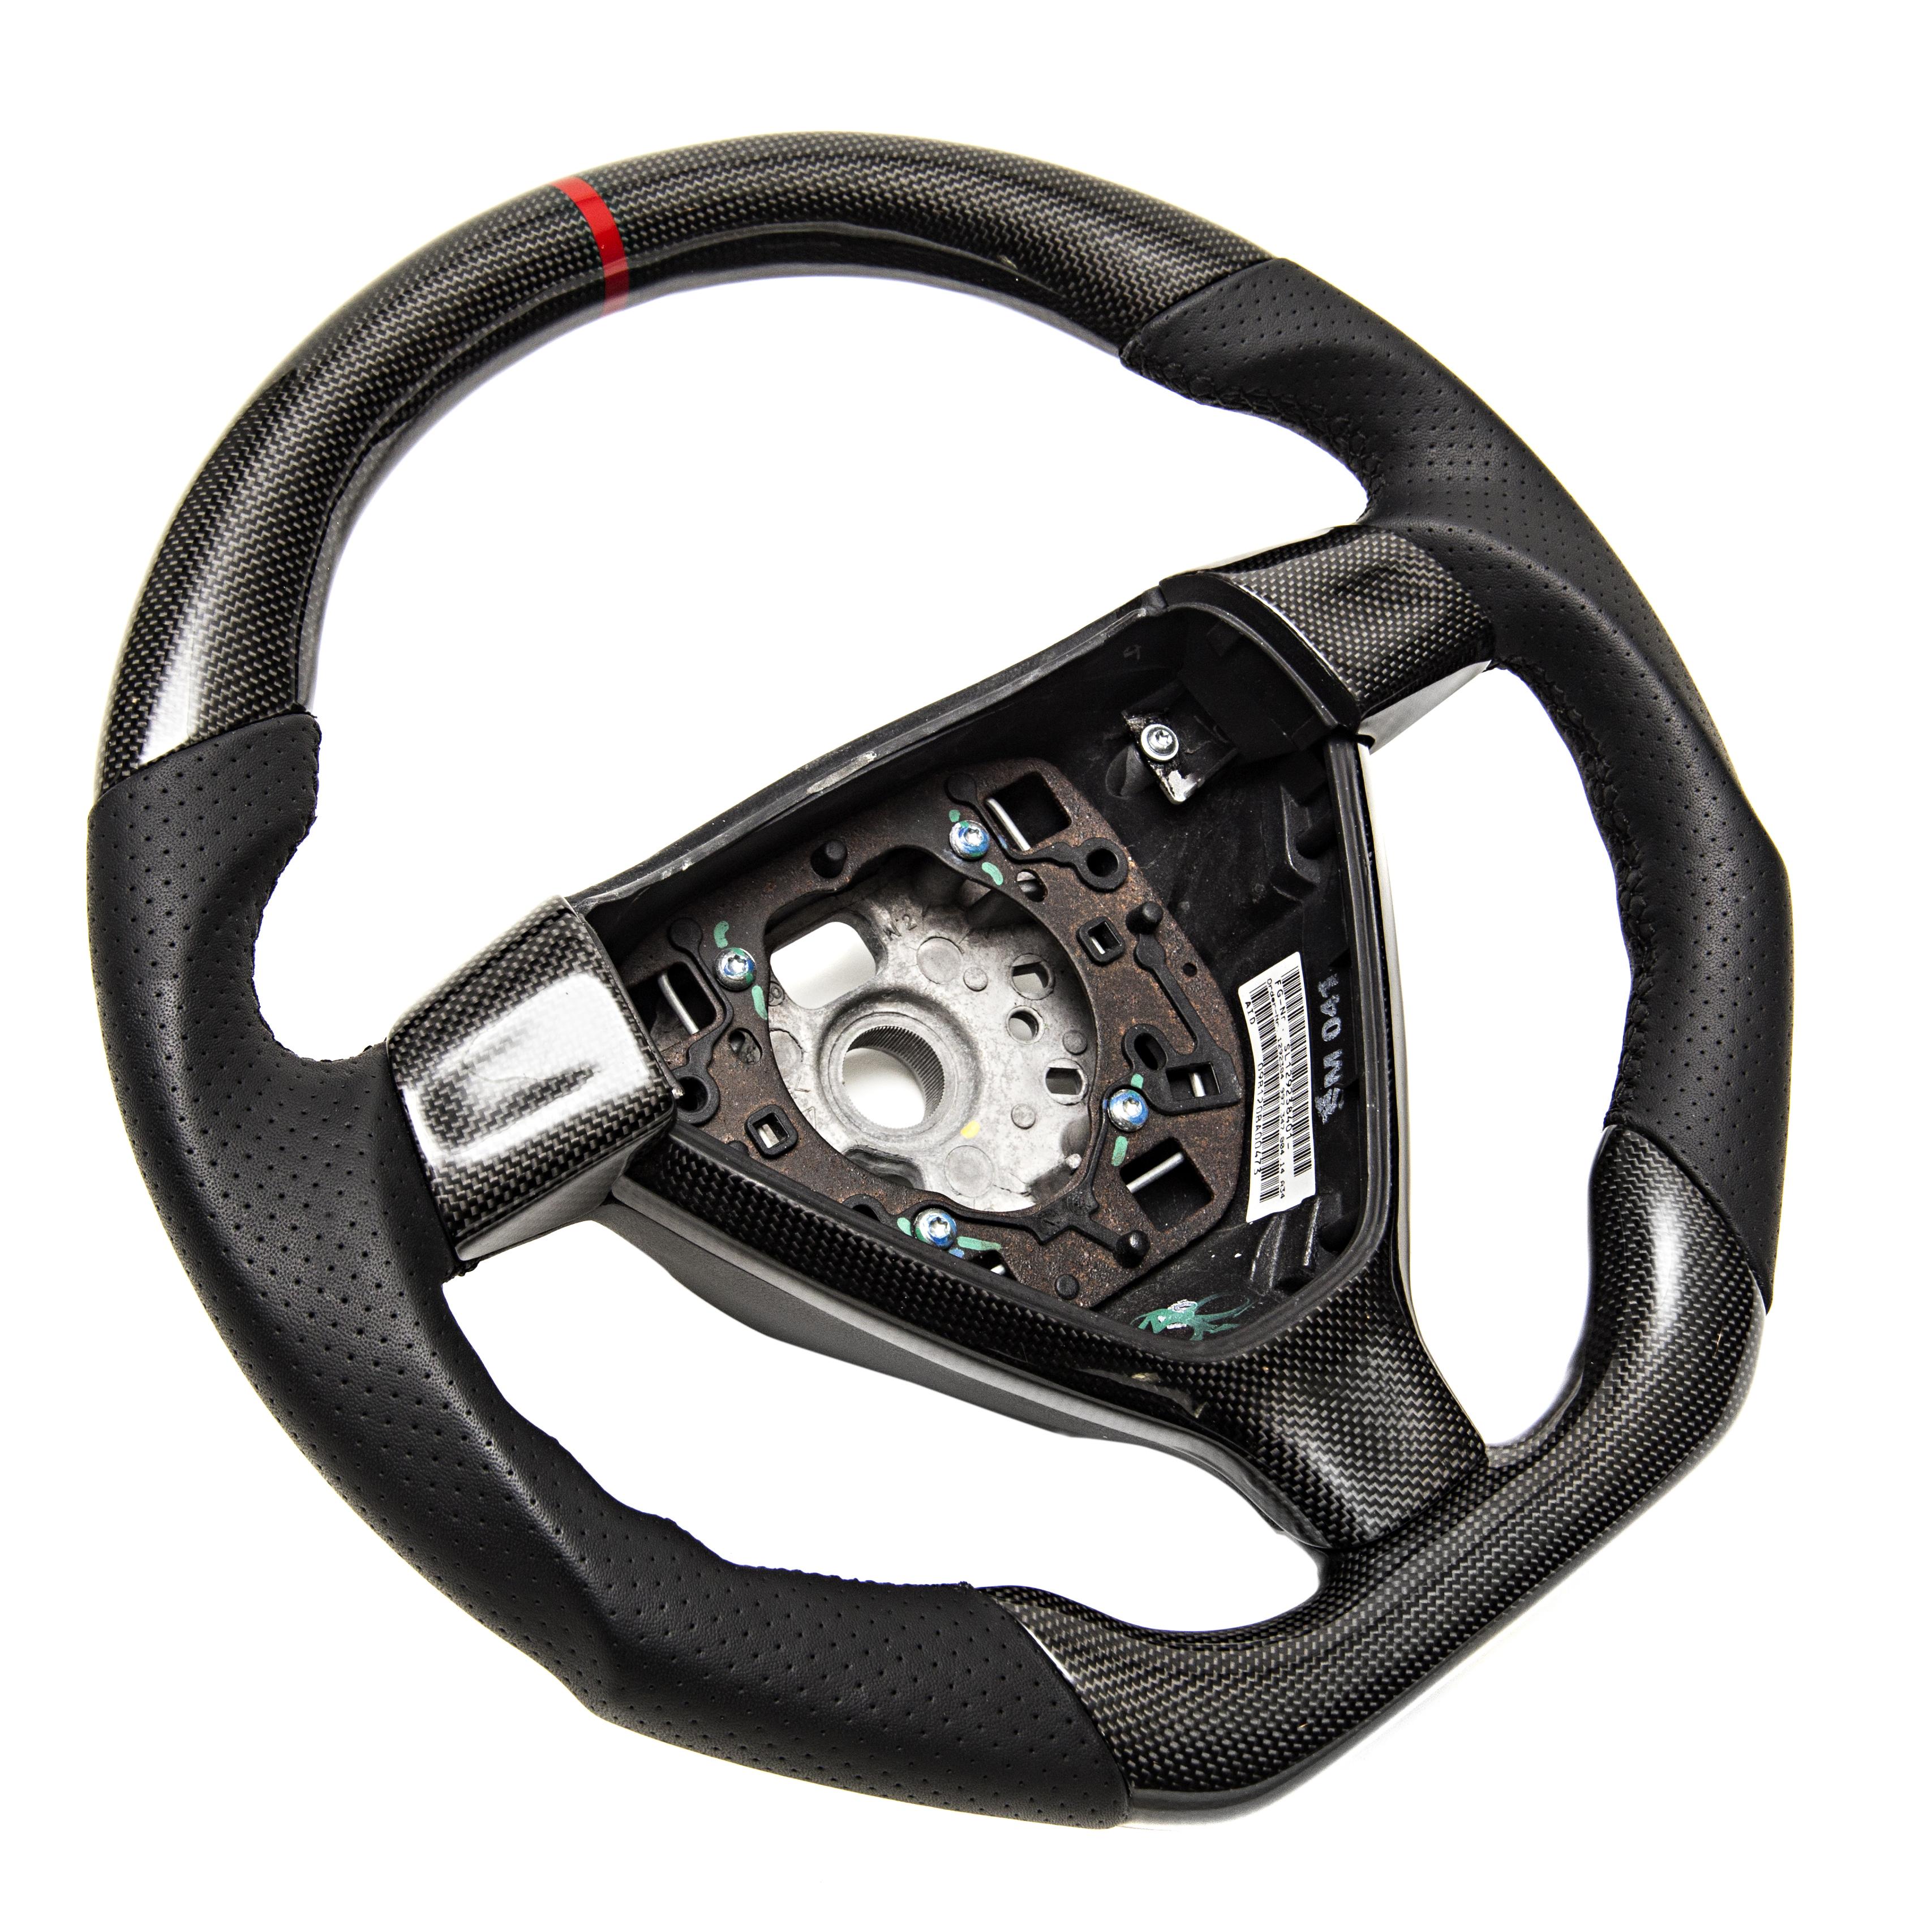 997 987 Custom Carbon Fiber Steering Wheel 1099 99 With